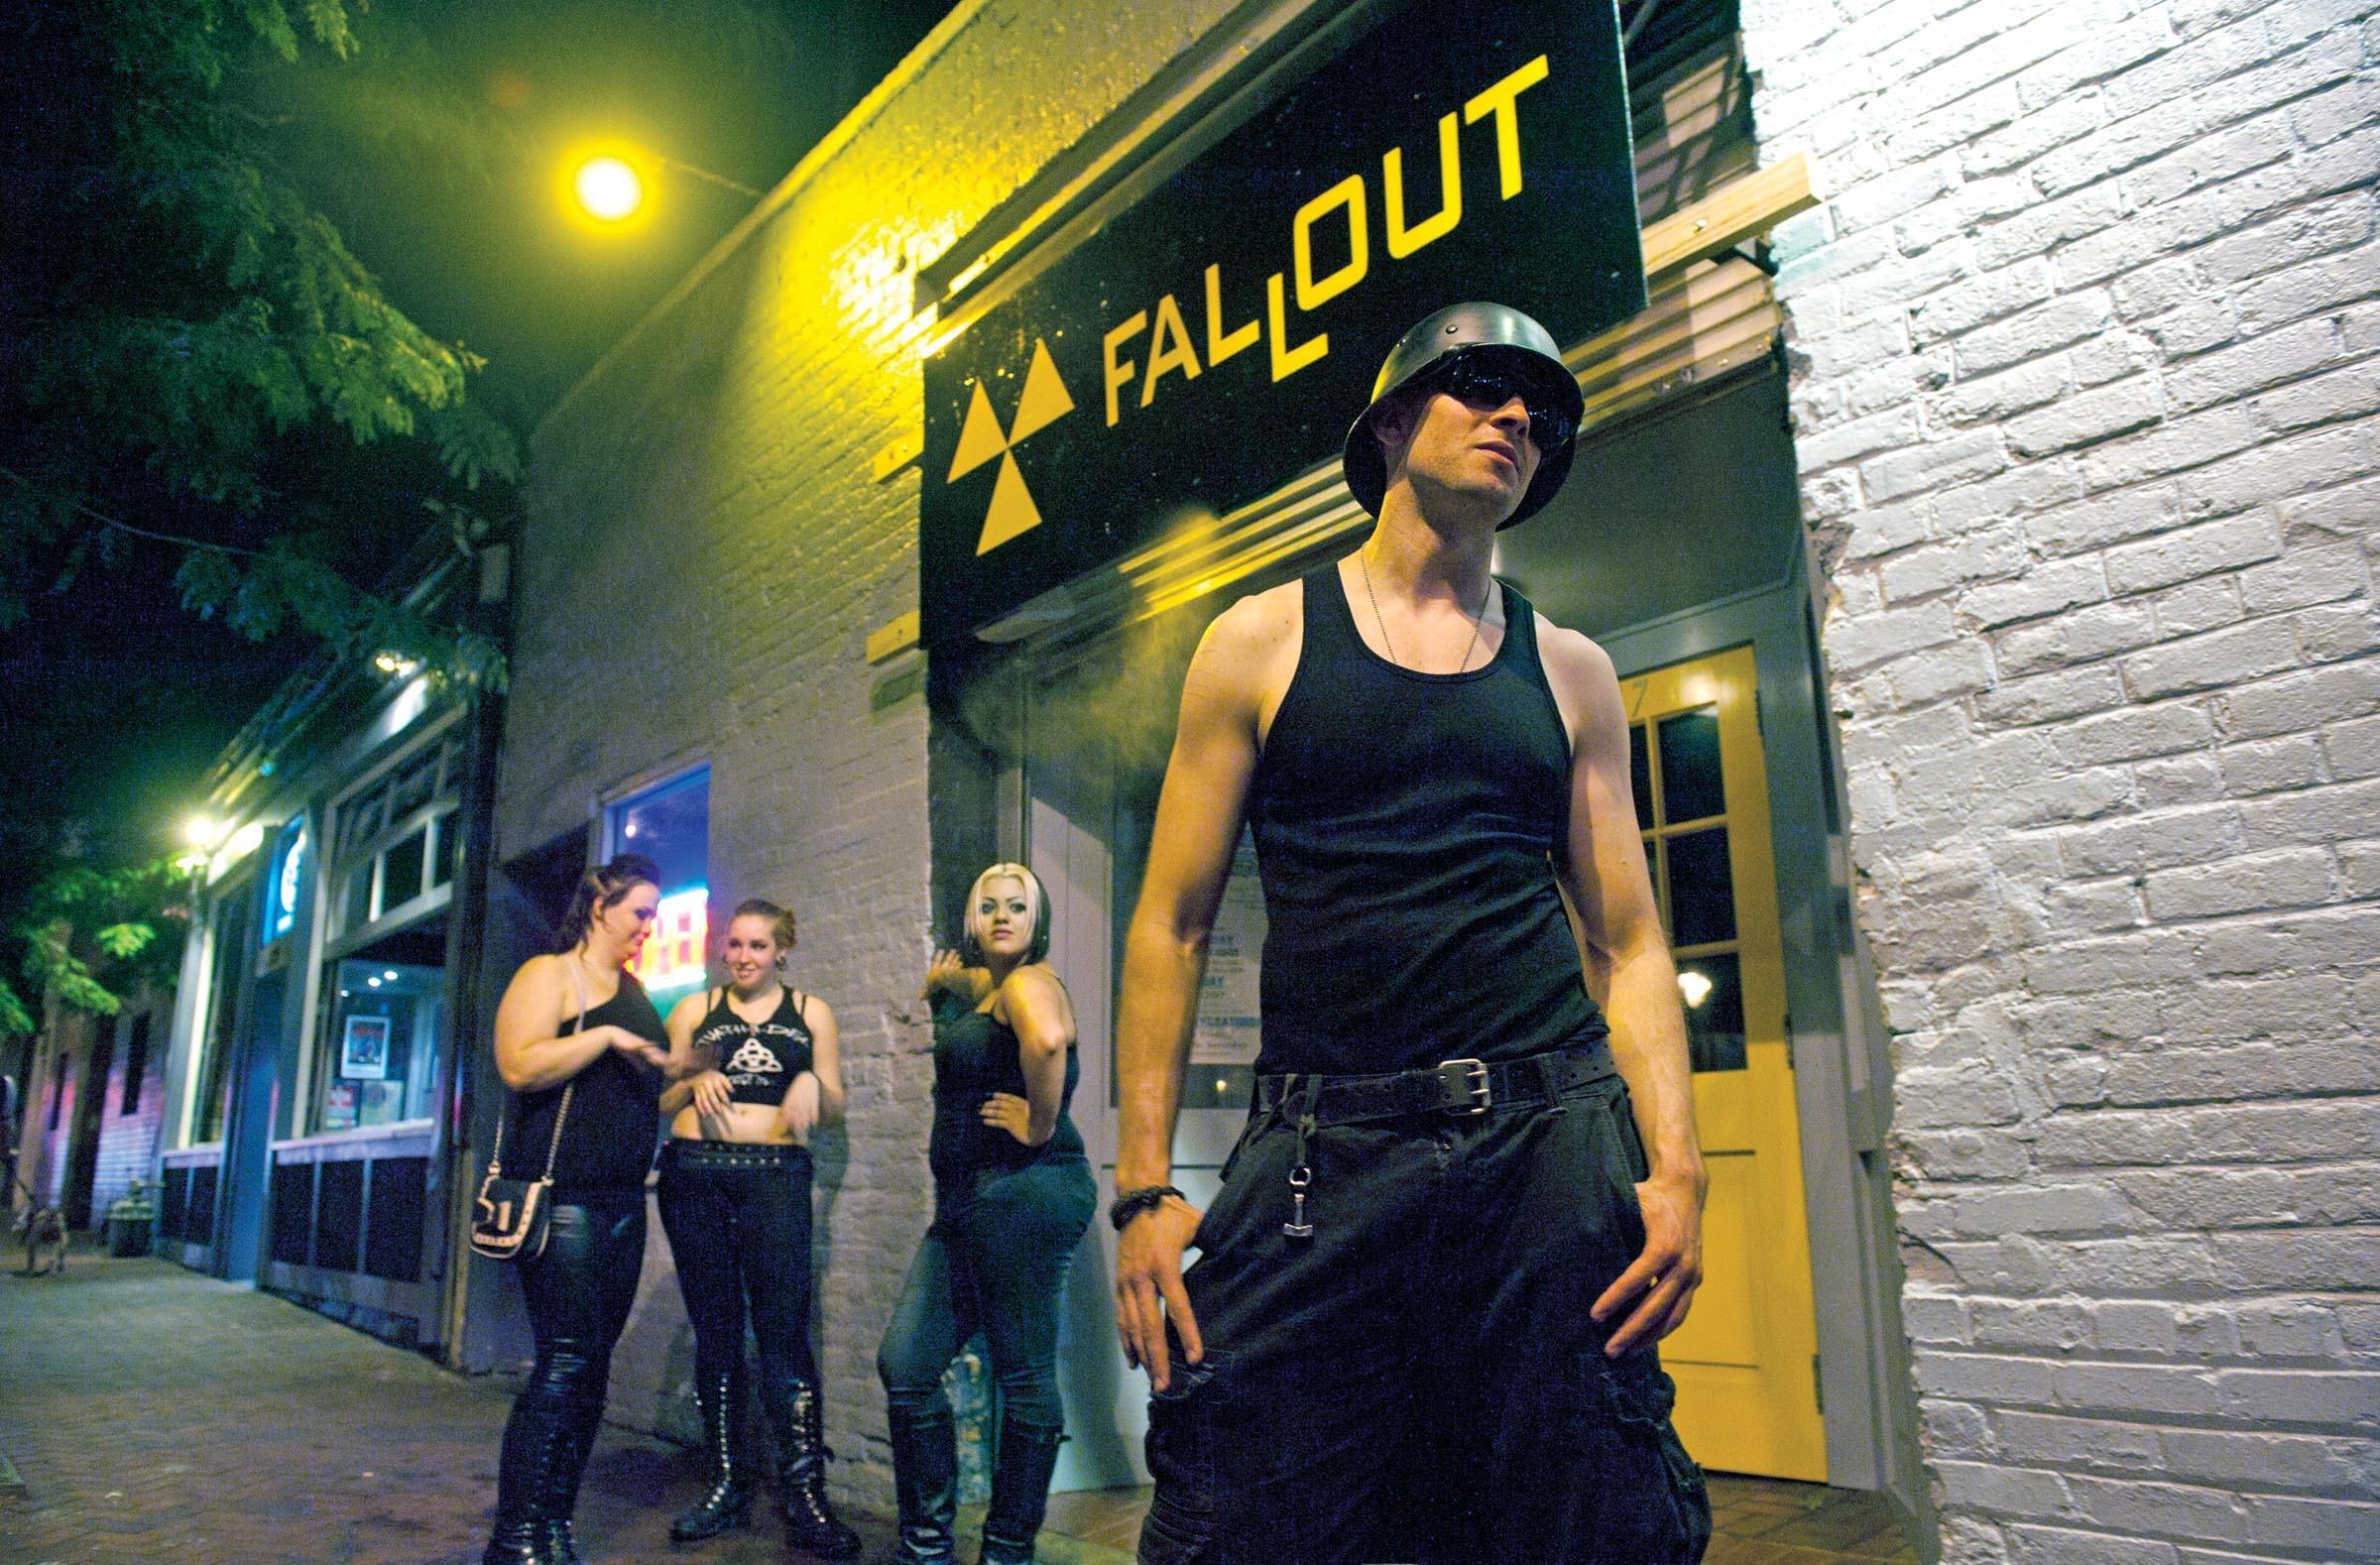 Regan Lodge enjoys a theme night at Fallout. - SCOTT ELMQUIST